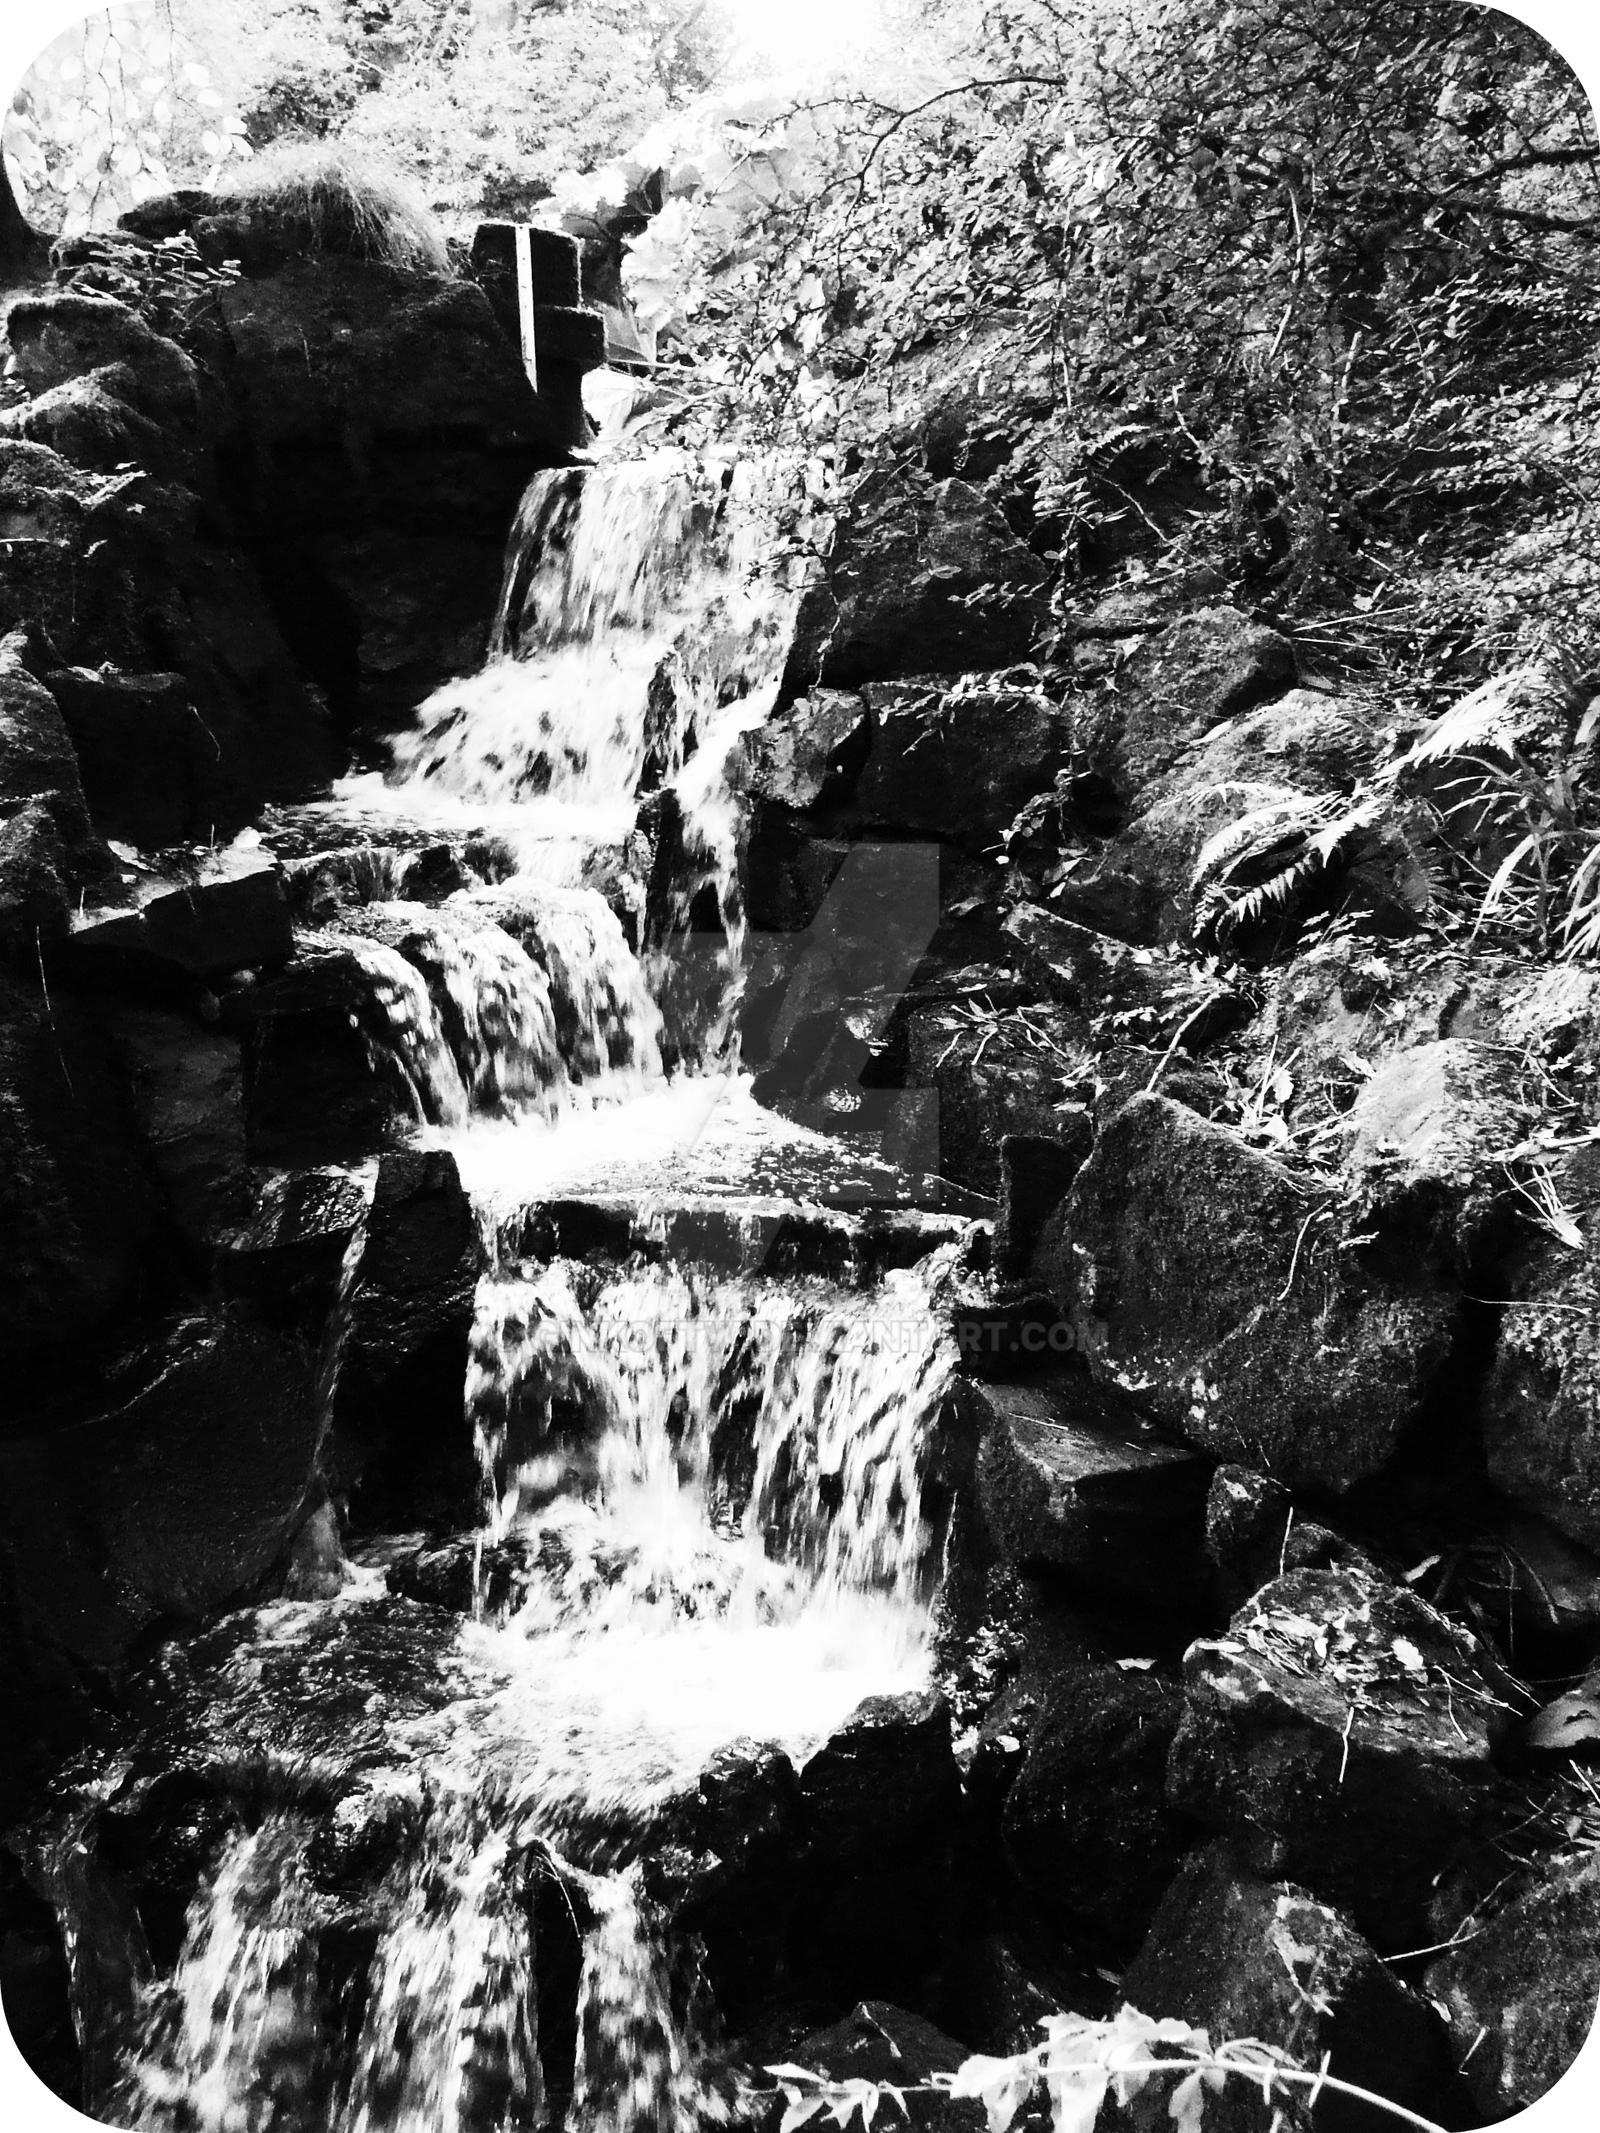 Mini waterfall by Ginkoftw